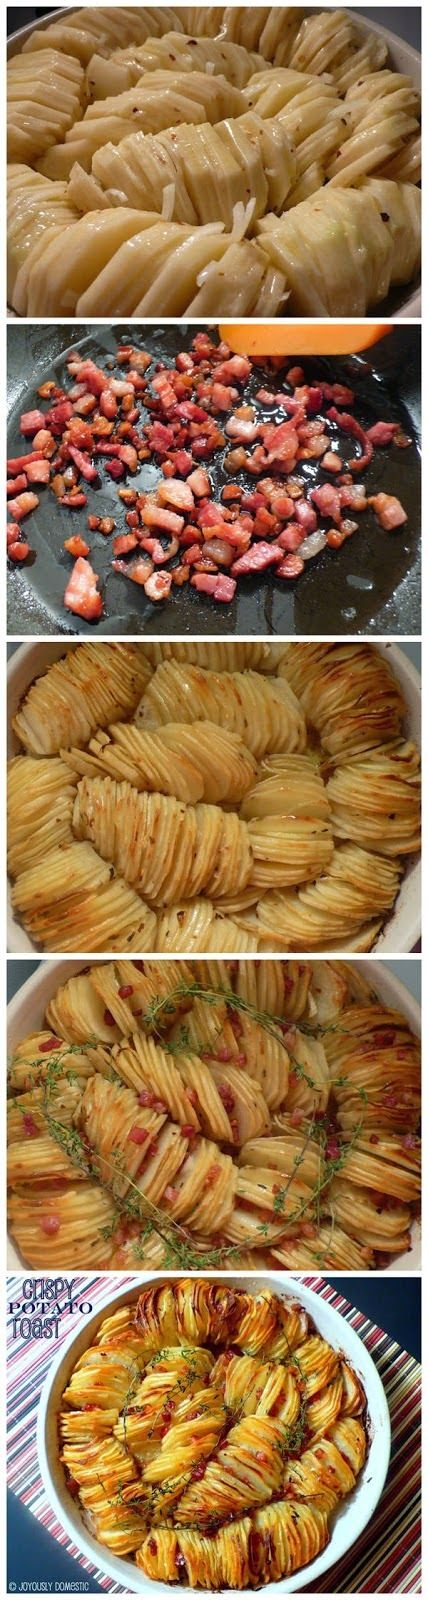 Crispy Potato Roast - Delicious Recipeez